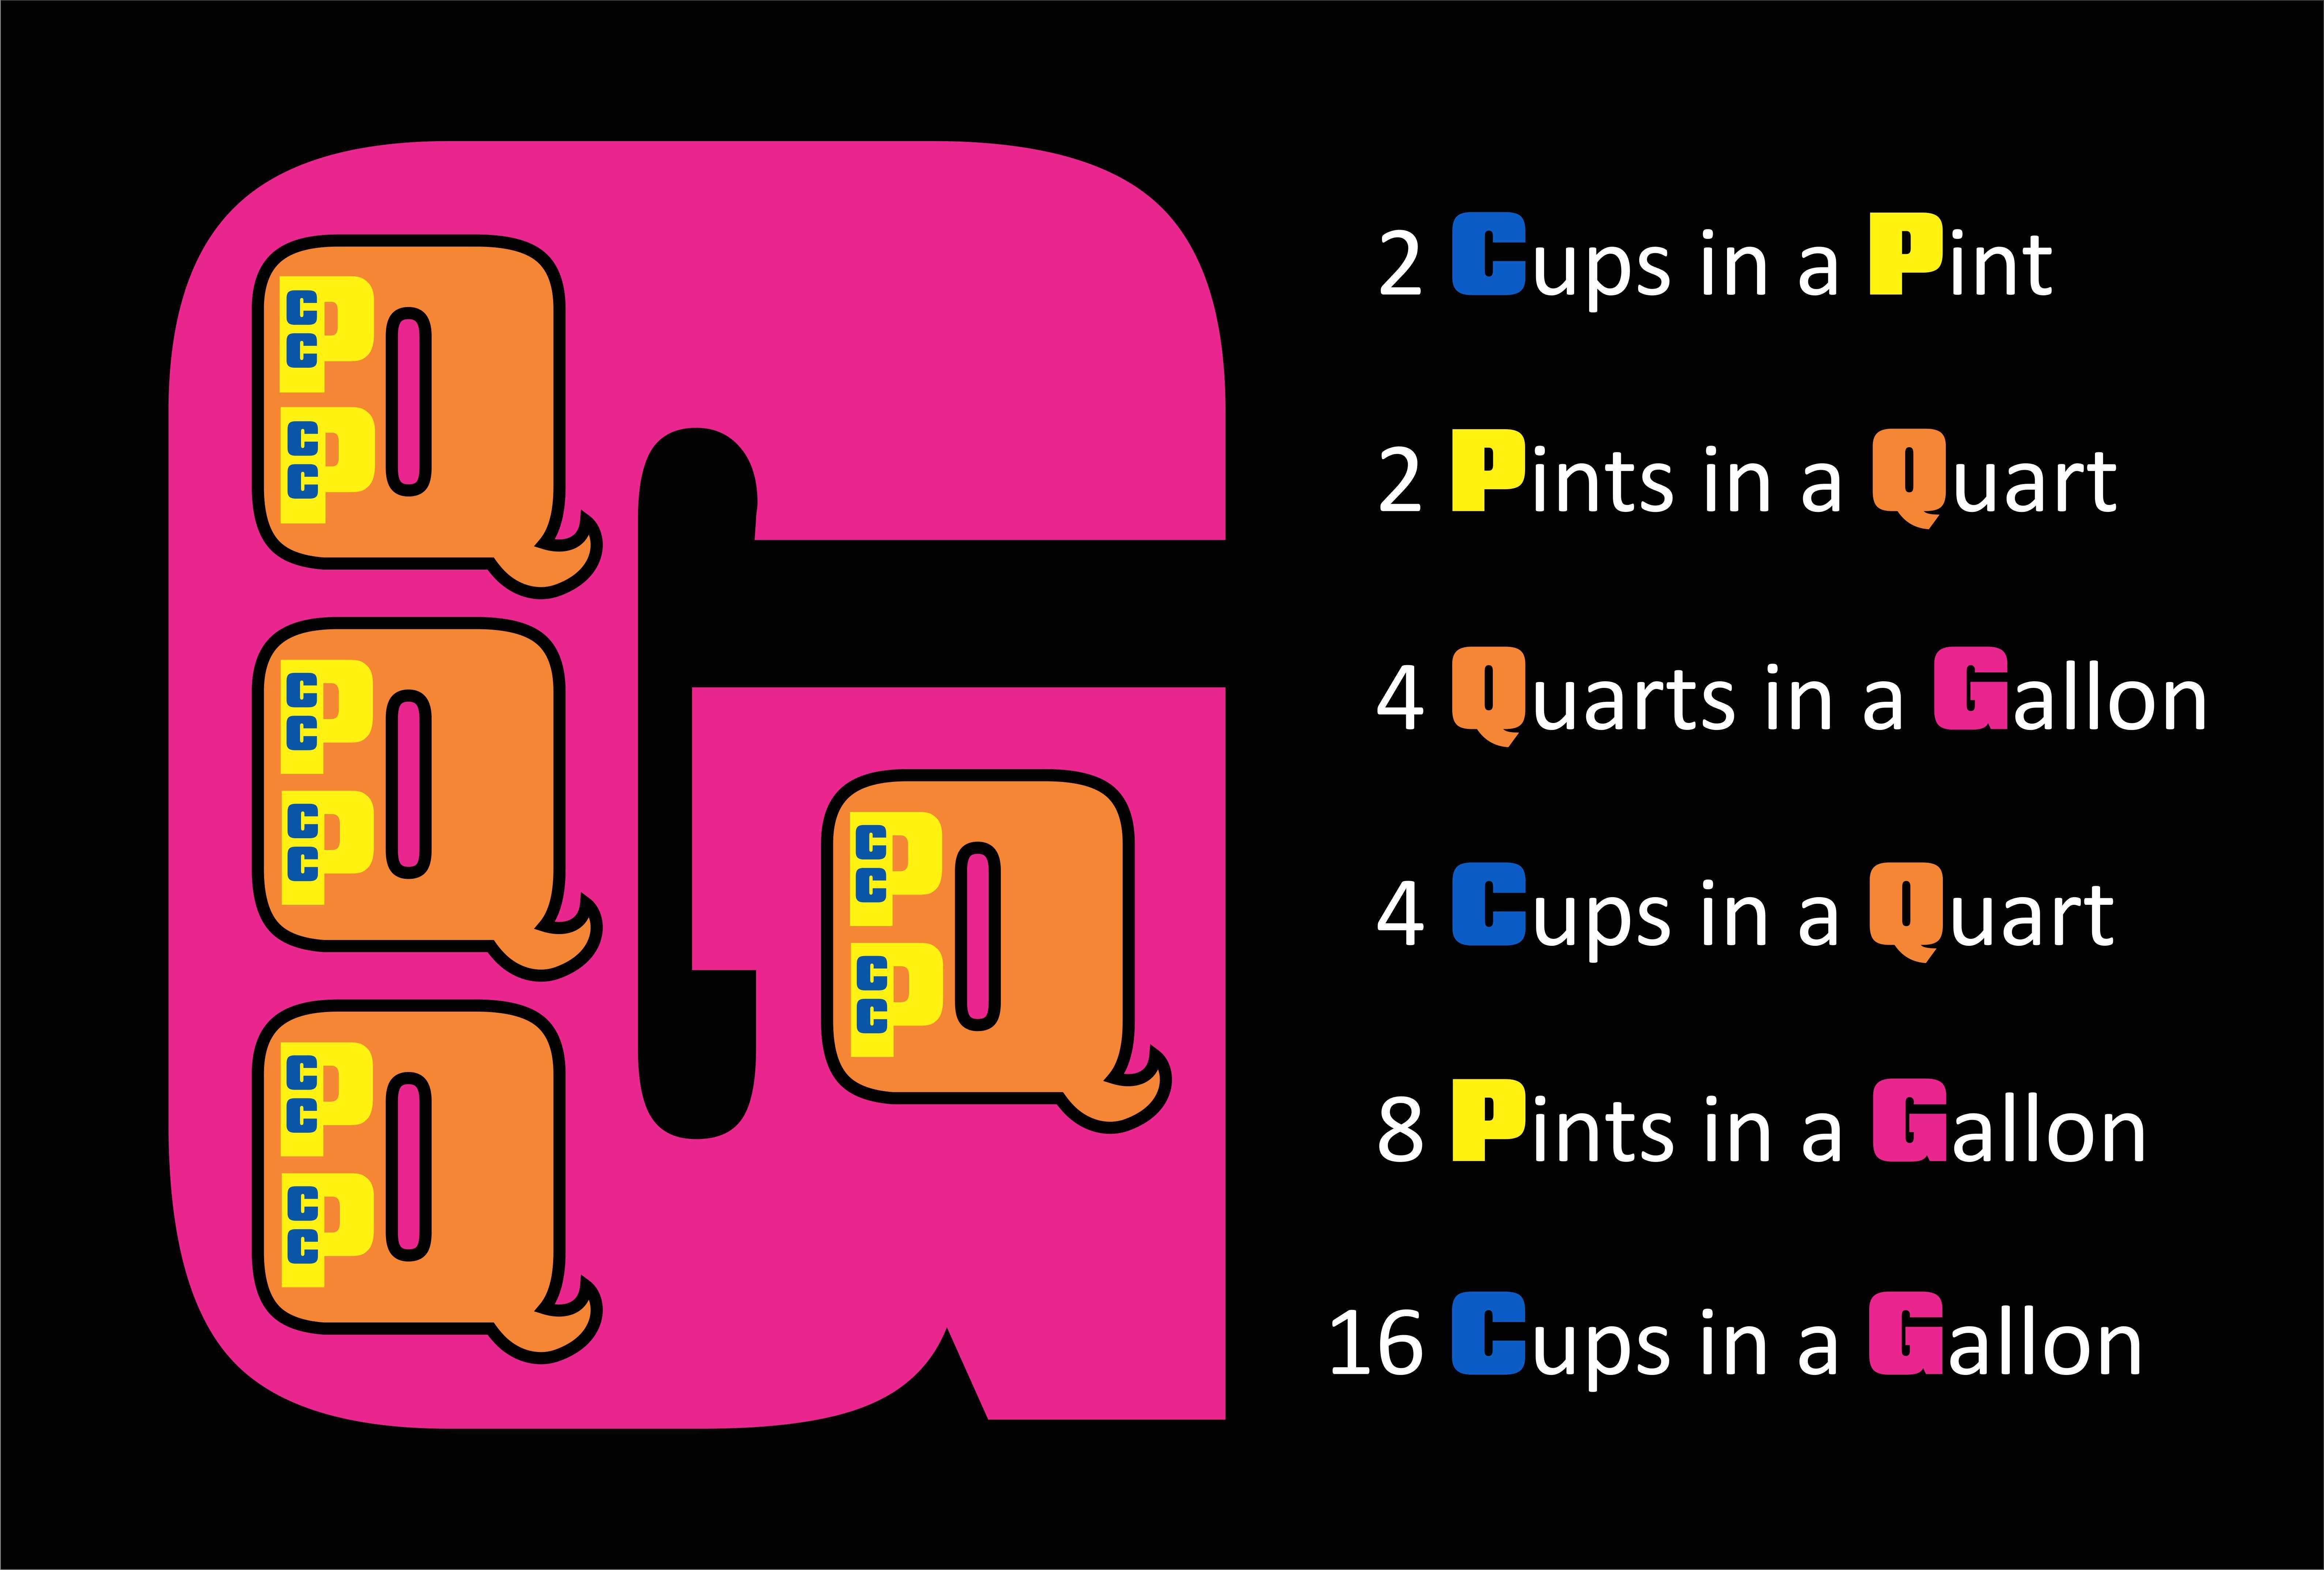 2 Cups In A Pint 2 Pints In A Quart 4 Quarts In A Gallon